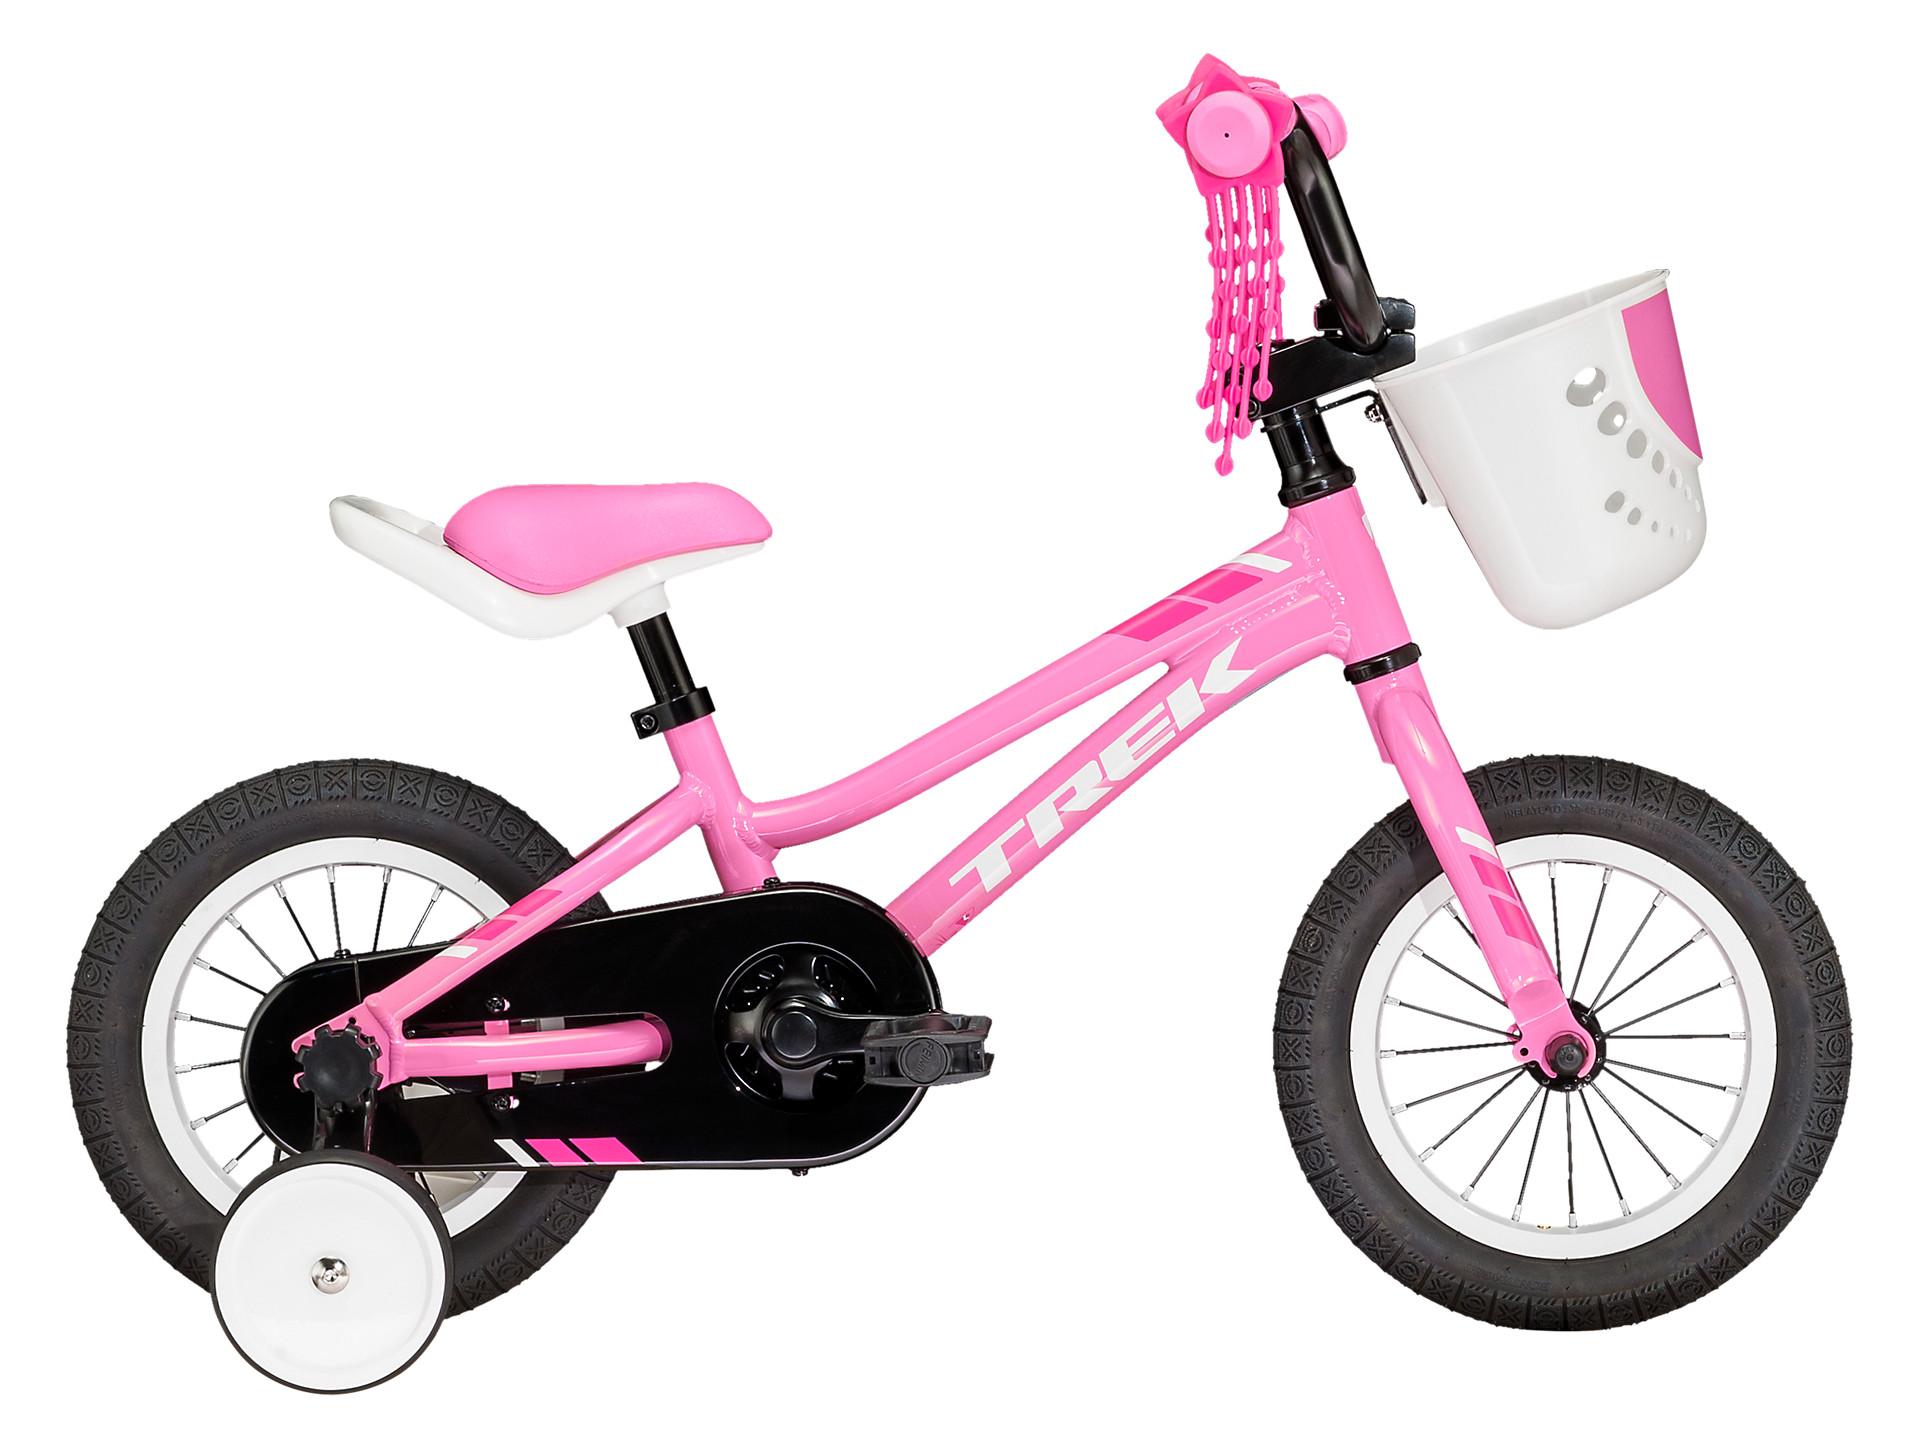 78549fee735 Precaliber 12 Girl's | Trek Bikes